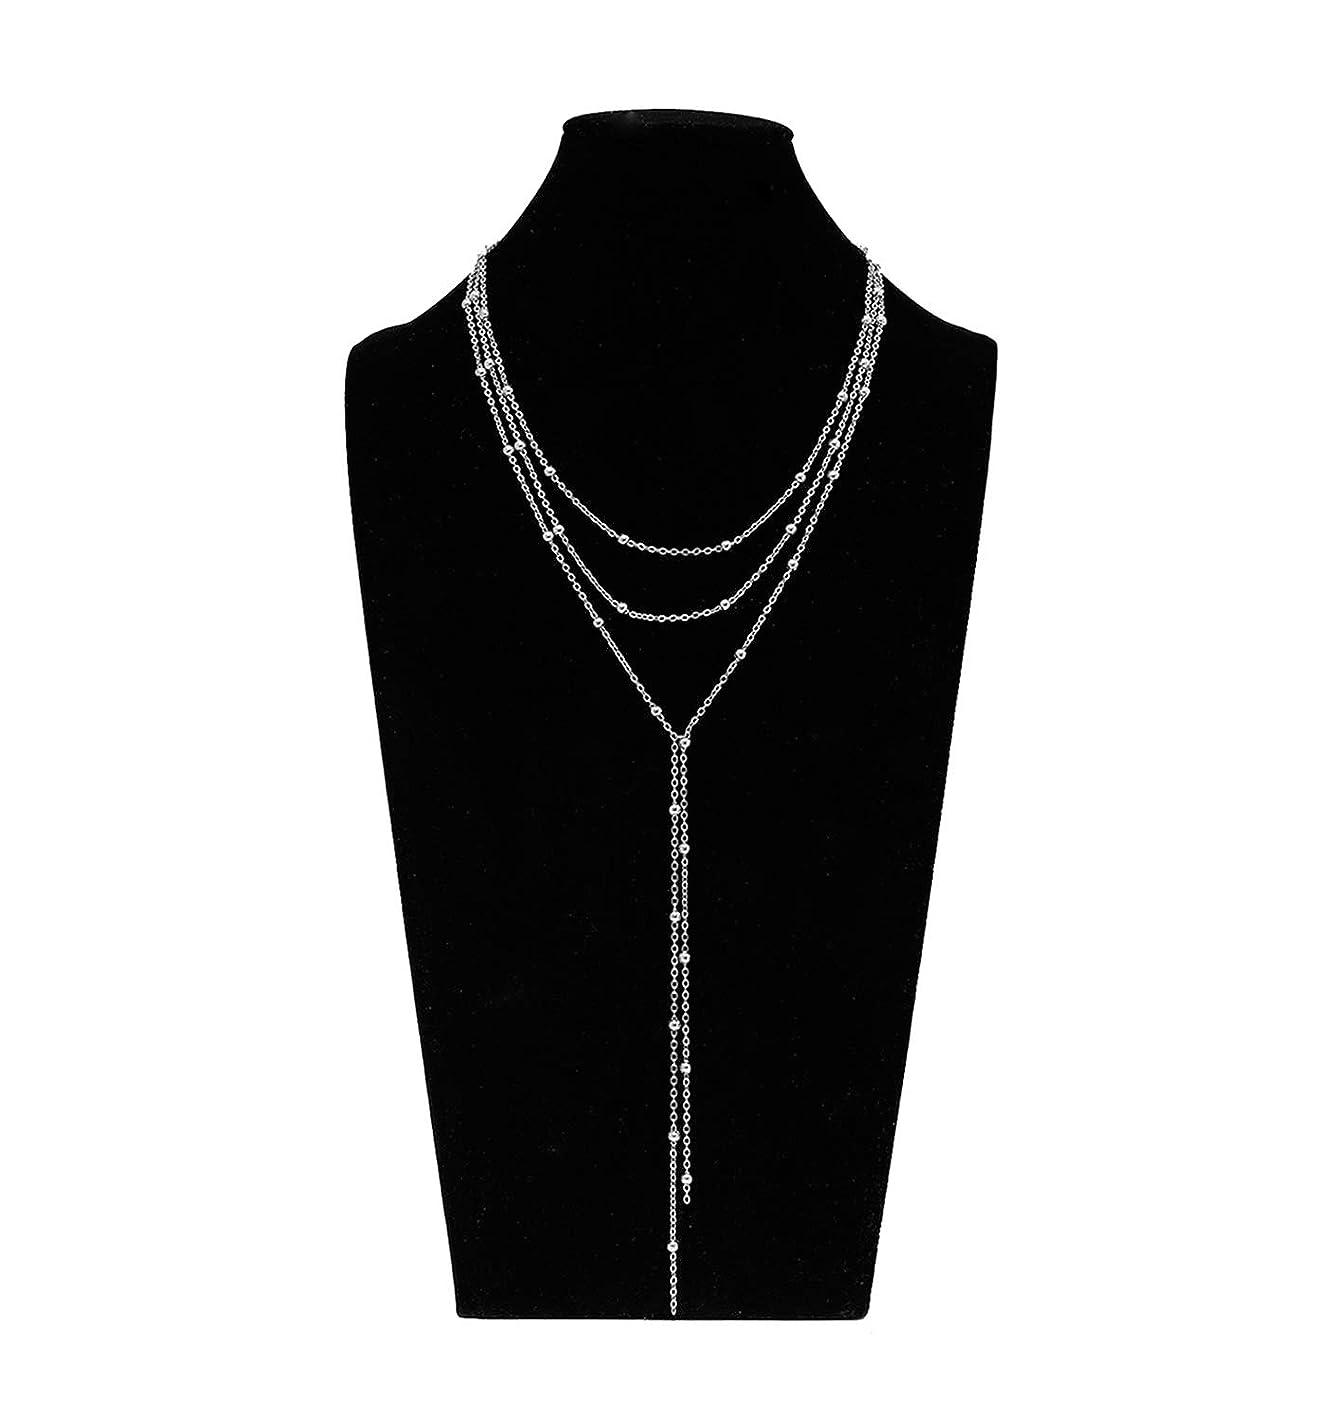 MOLOCH Layer Choker Long Chain Tassel Pendant Necklace for Women Girls Handmade Bead Station y Necklace Charm Chain Jewelry Necklace